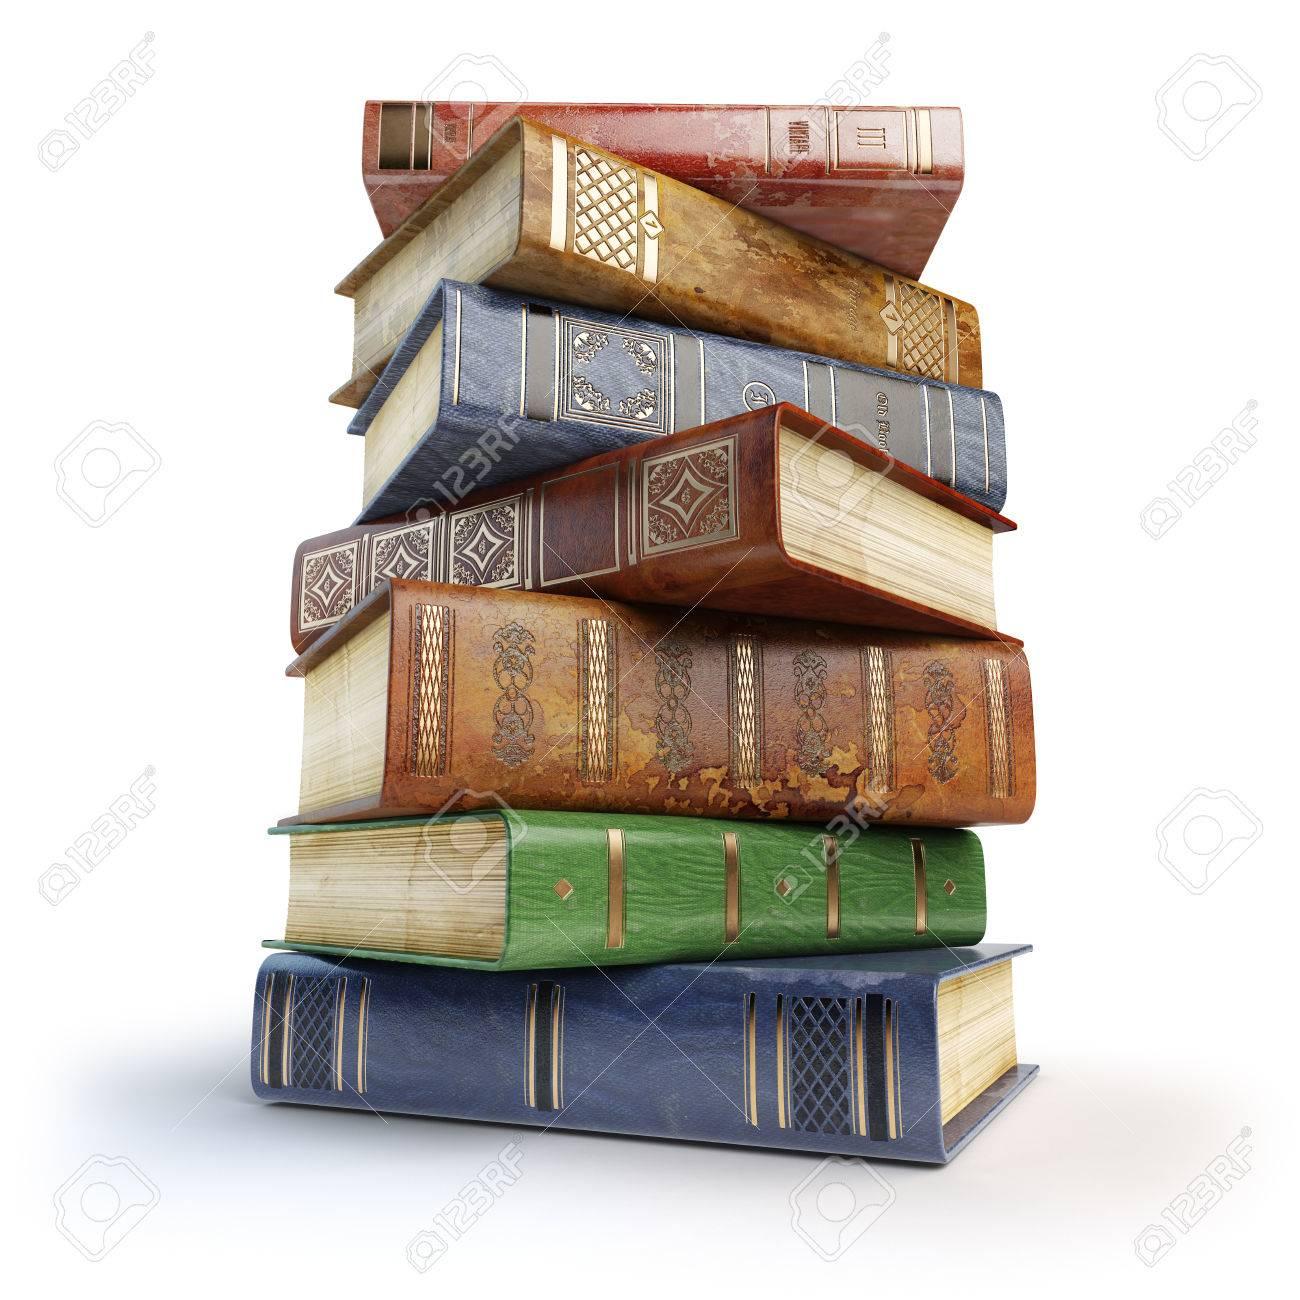 Libros Viejos Pila De Libros Antiguos Aislados En Blanco 3d